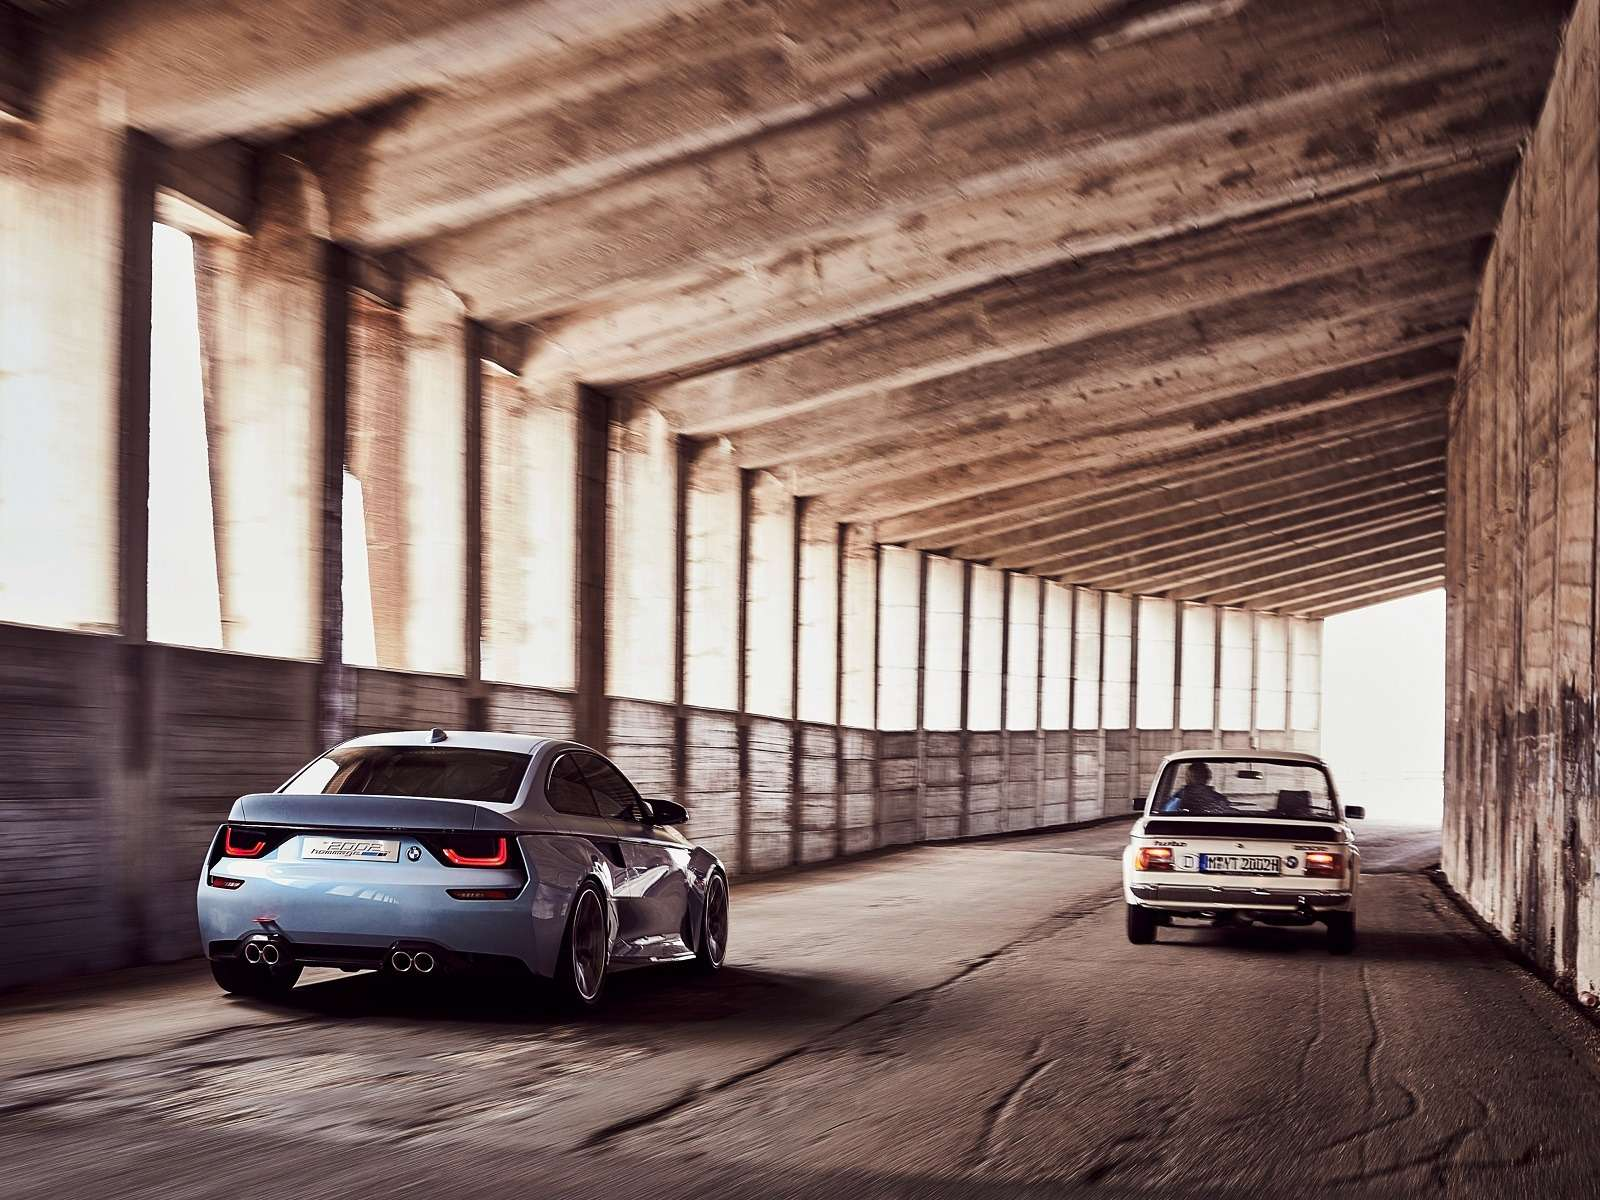 Иллюзия легенды: BMW поупражнялась натему 2002 turbo— фото 590506